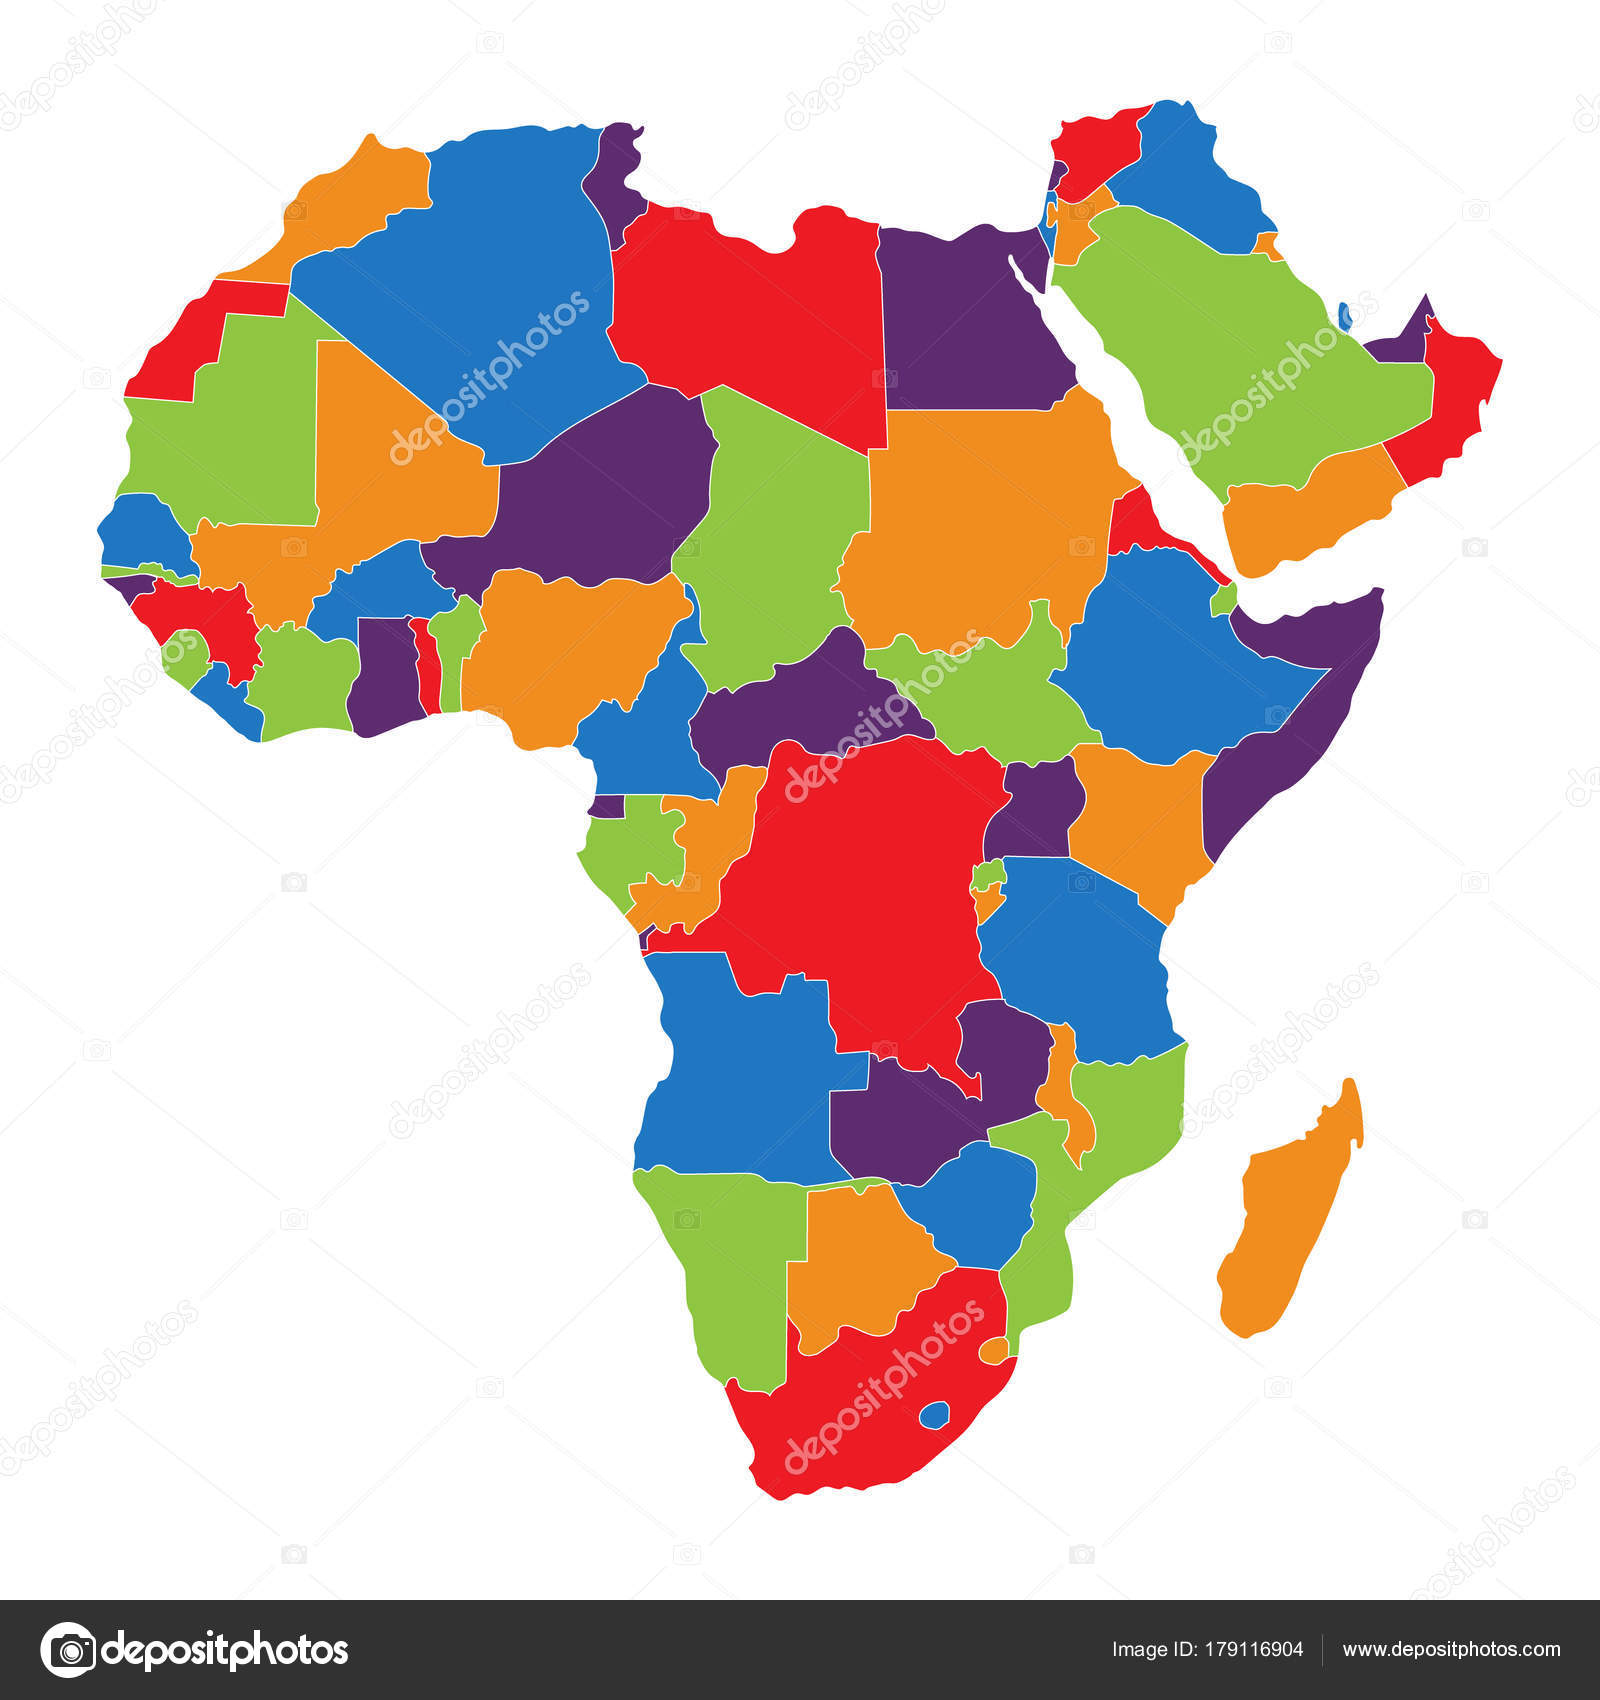 Africa map raster stock photo viktorijareut 179116904 africa map raster stock photo gumiabroncs Gallery